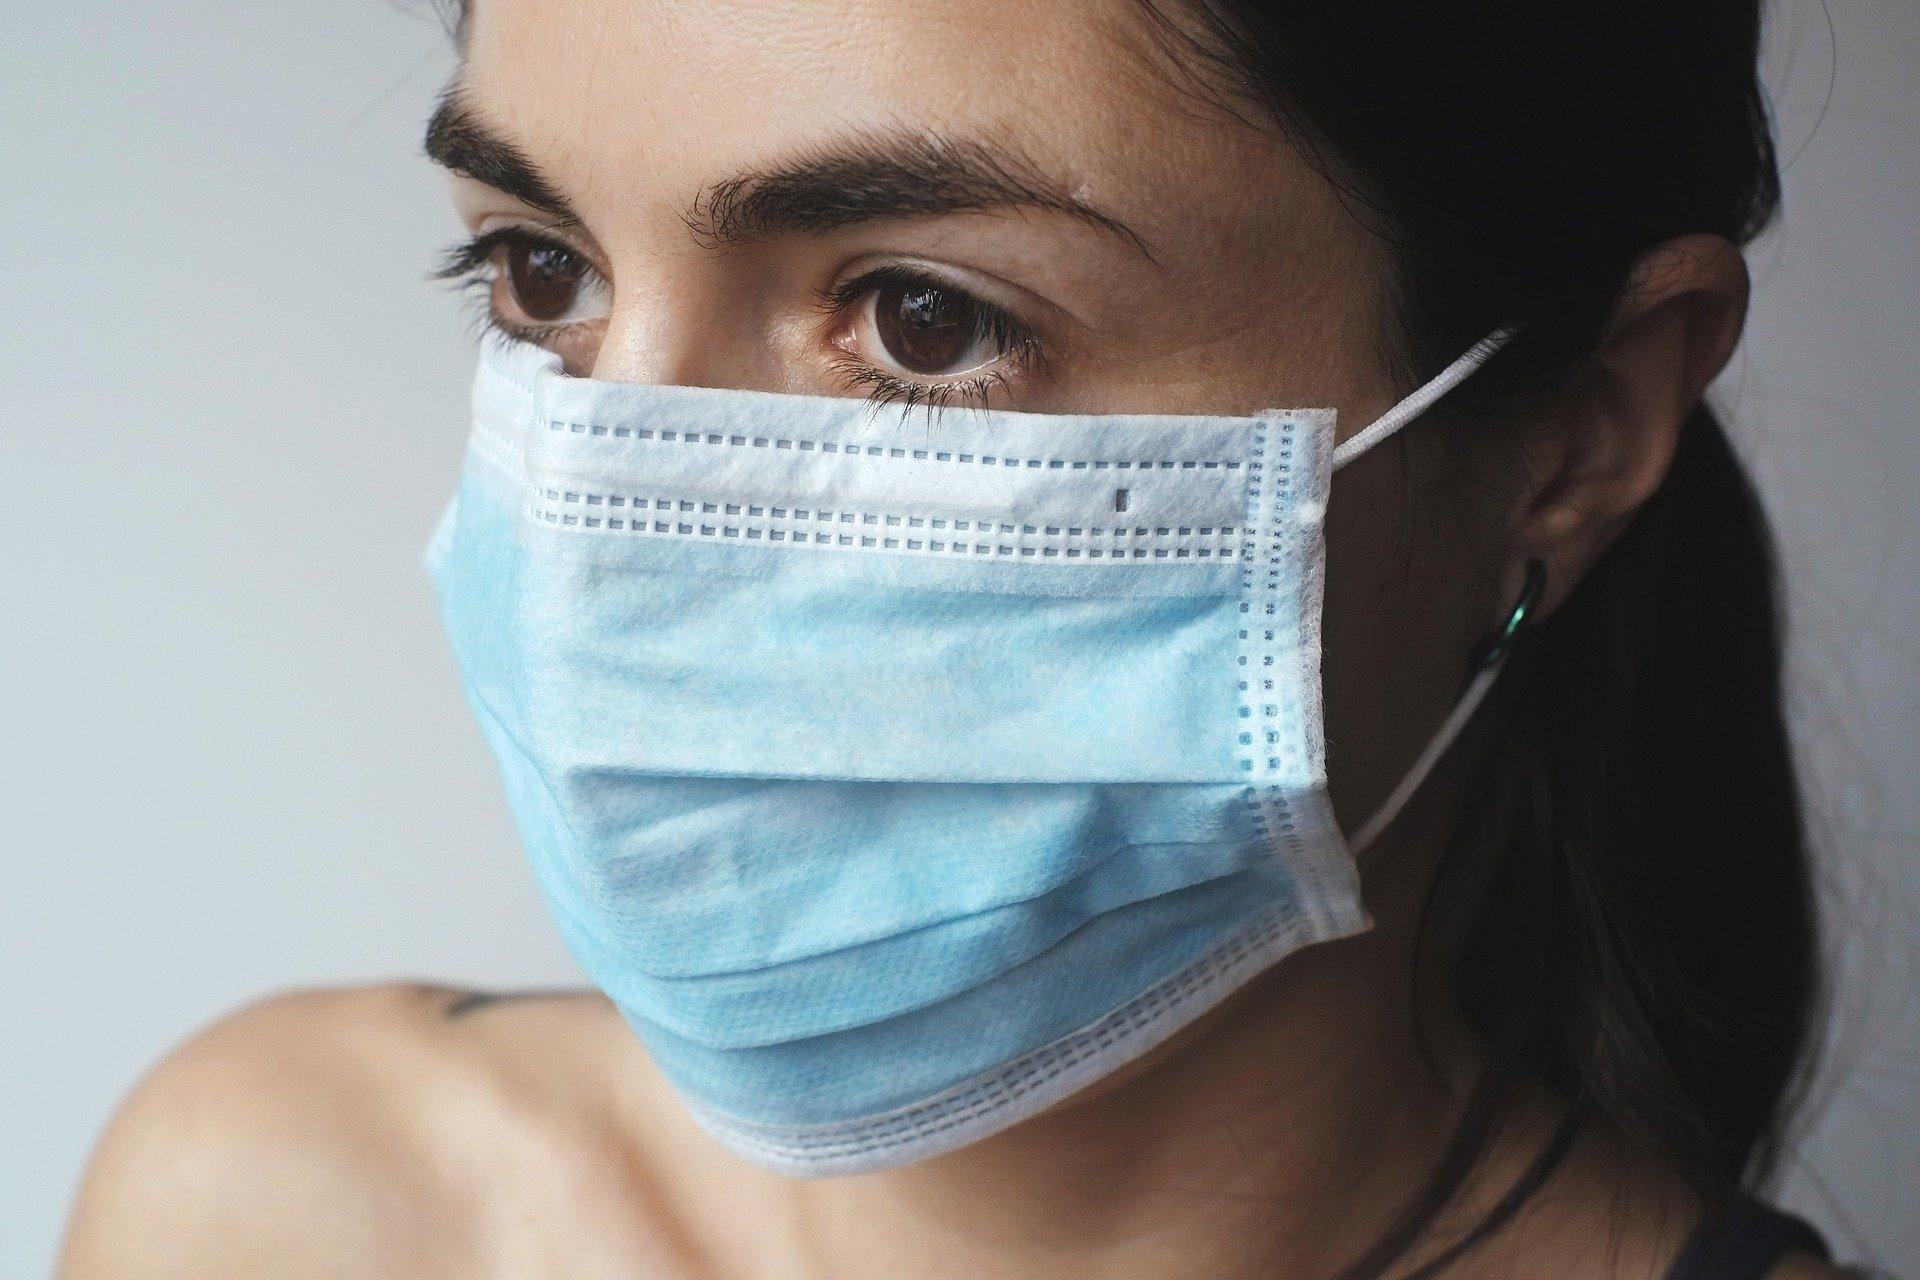 Working together to keep us all safe - Coronavirus